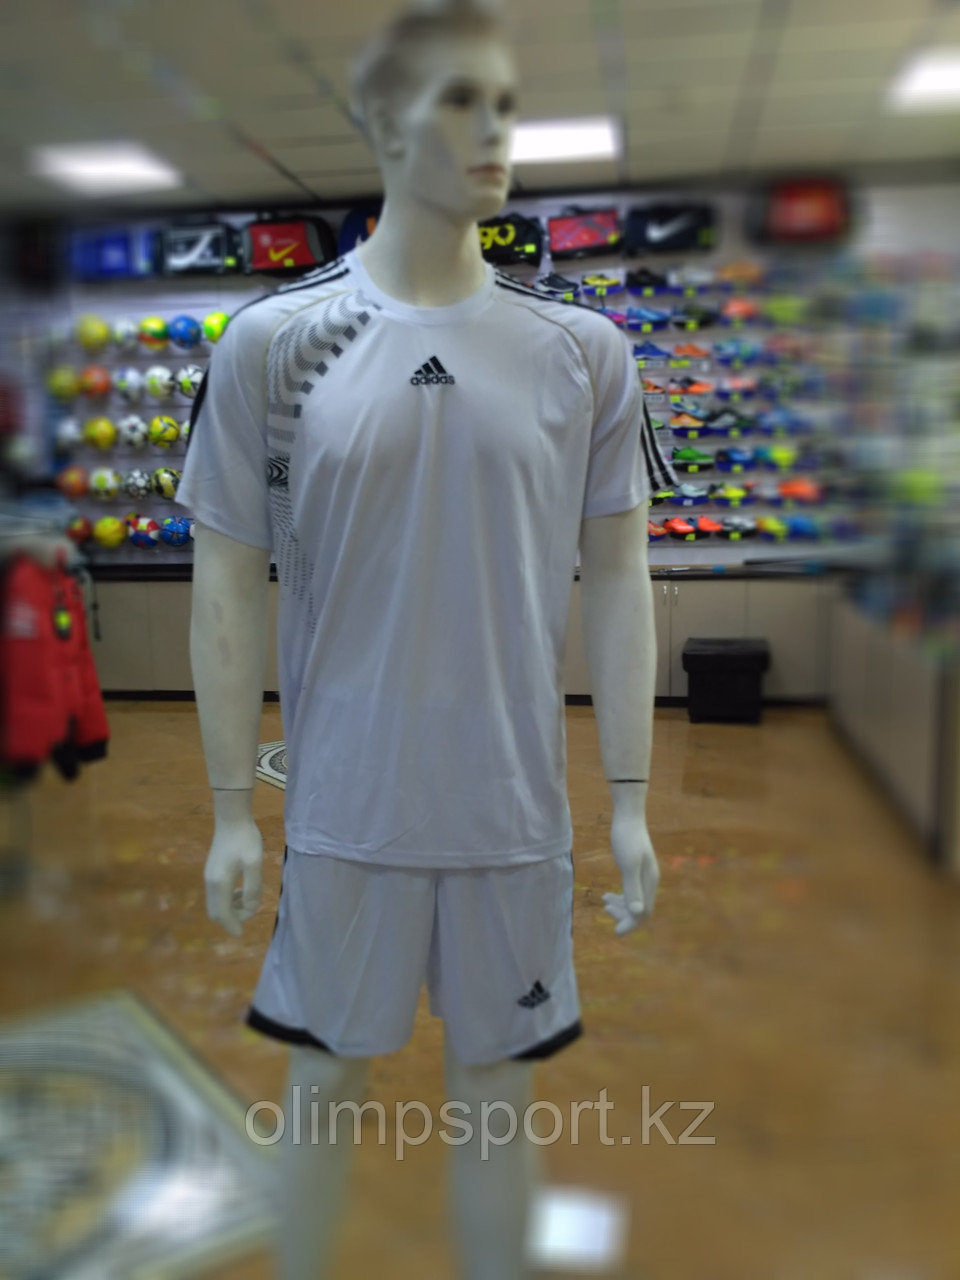 Футбольная форма Adidas 915, белая